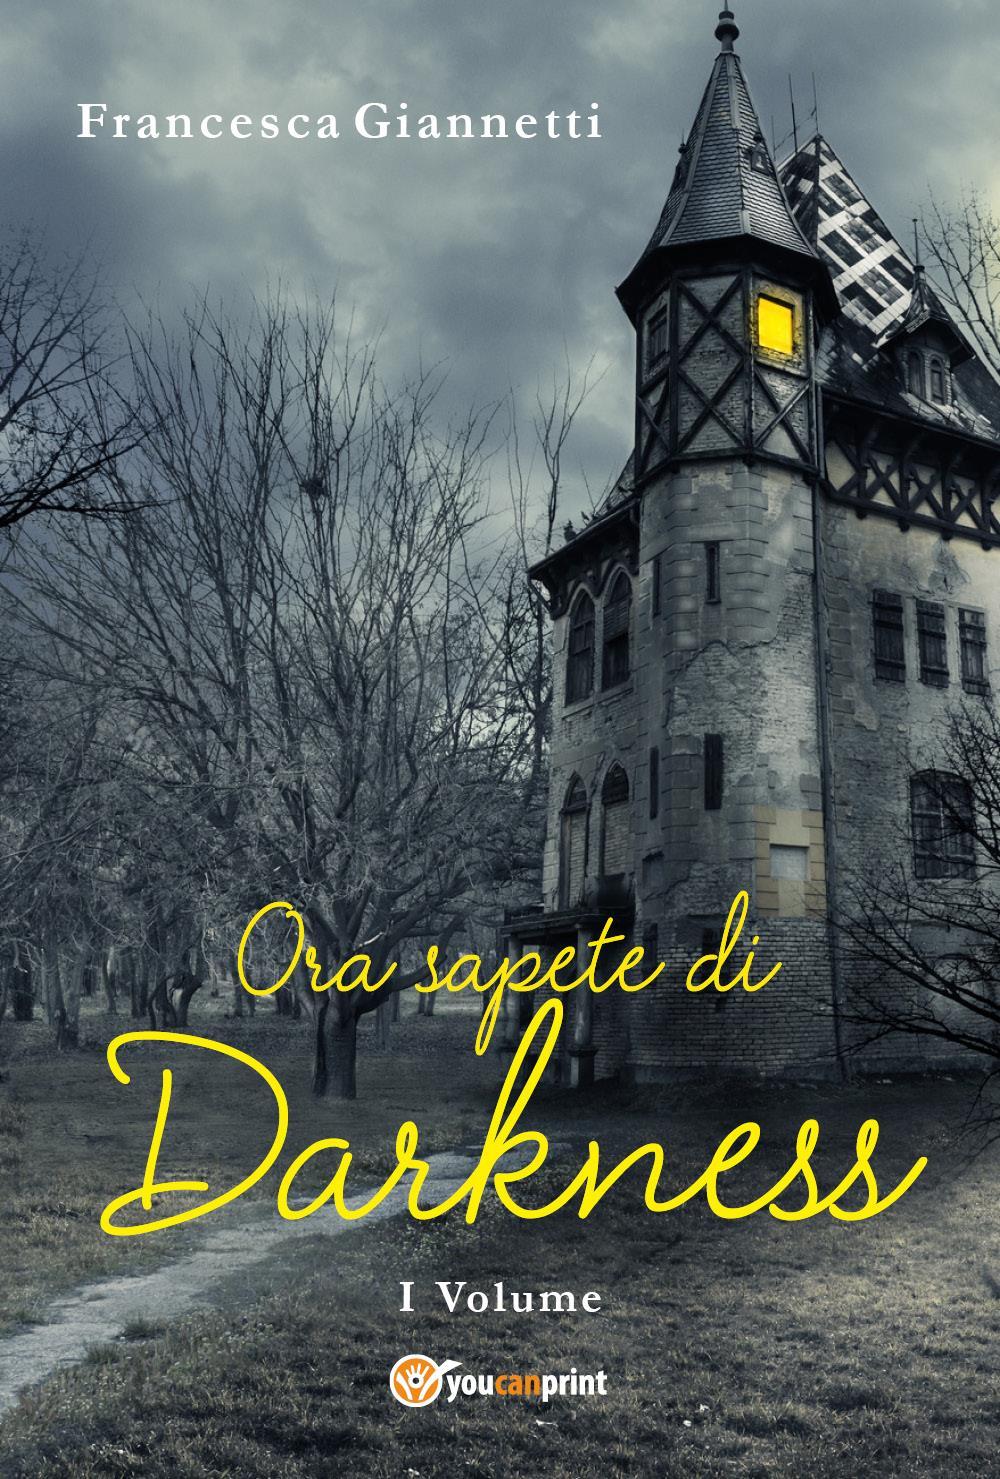 Ora sapete di Darkness